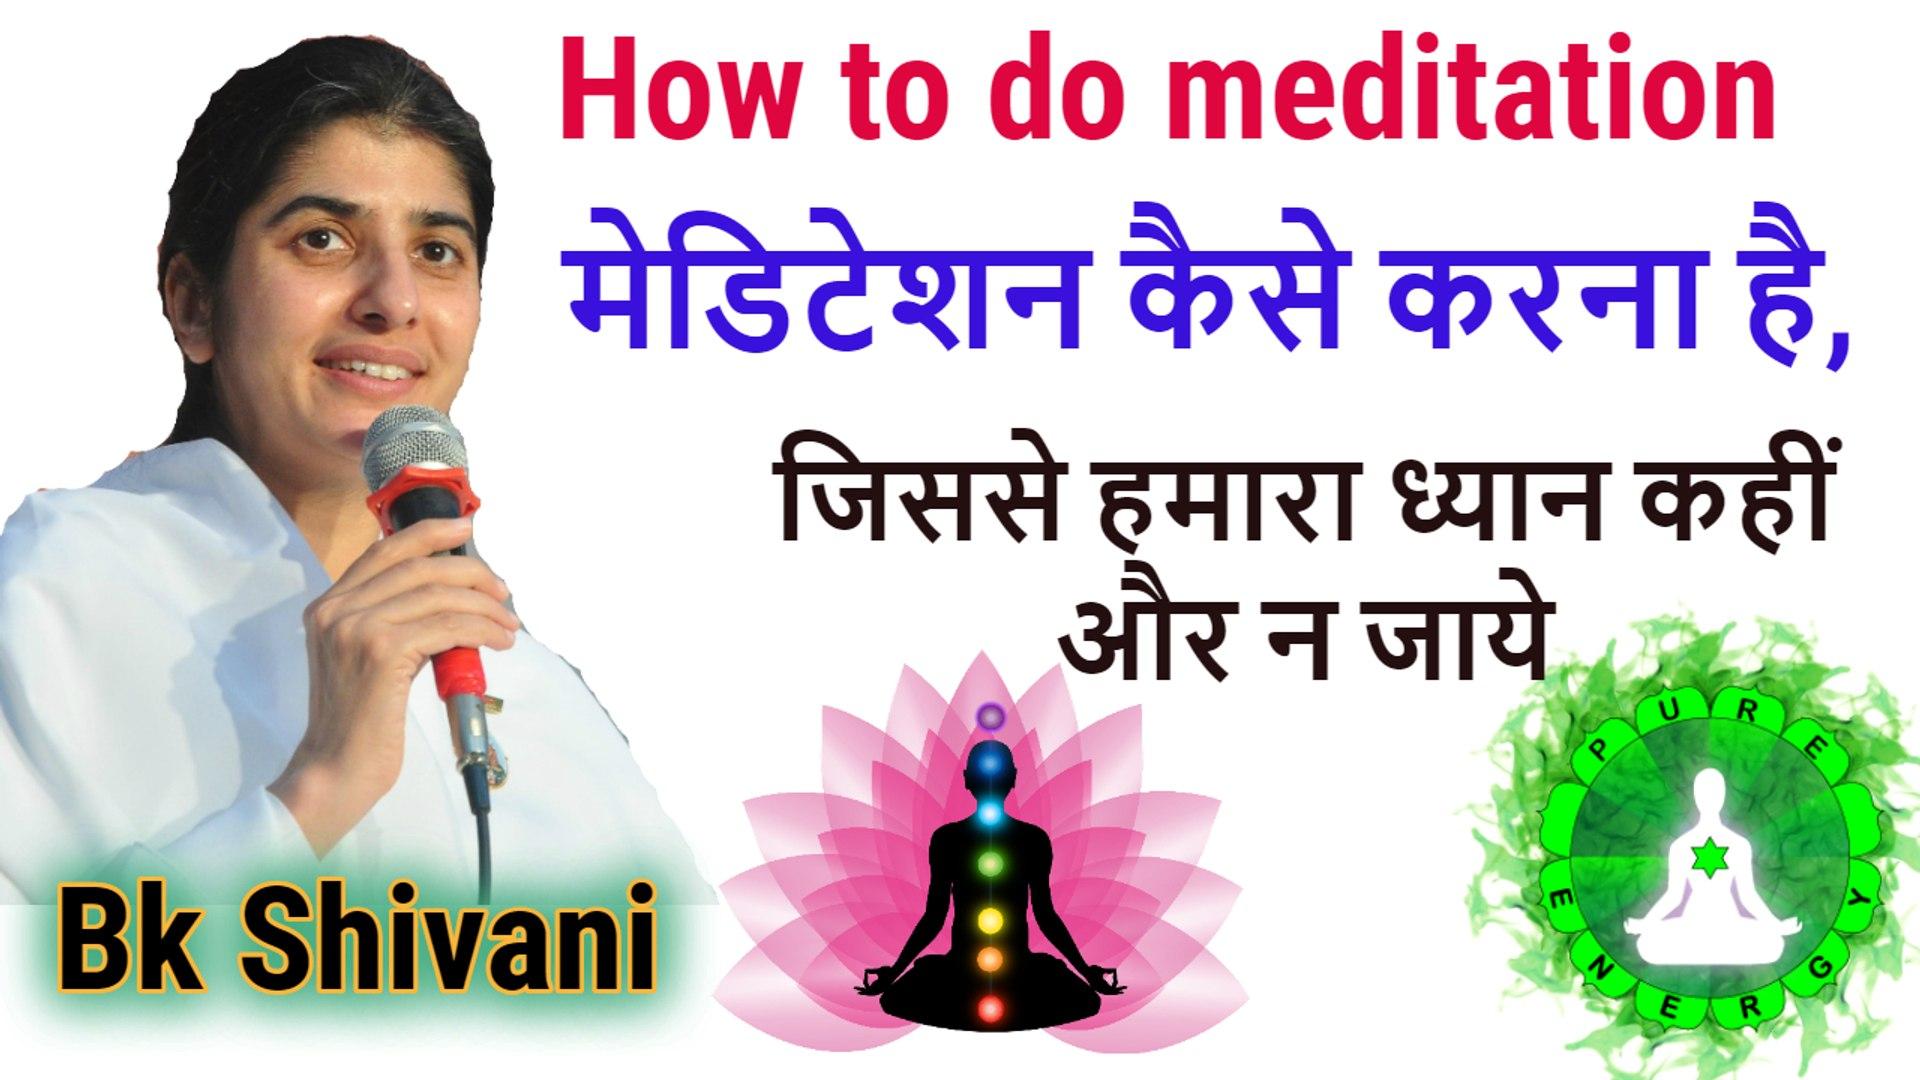 Bk Shivani Latest Speech, bk shivani latest Videos, bk shivani meditation,  bk shivani english, bk shivani hindi, bk shivani latest 2018, bk shivani  speech 2018, sister shivani speech 2018, siter